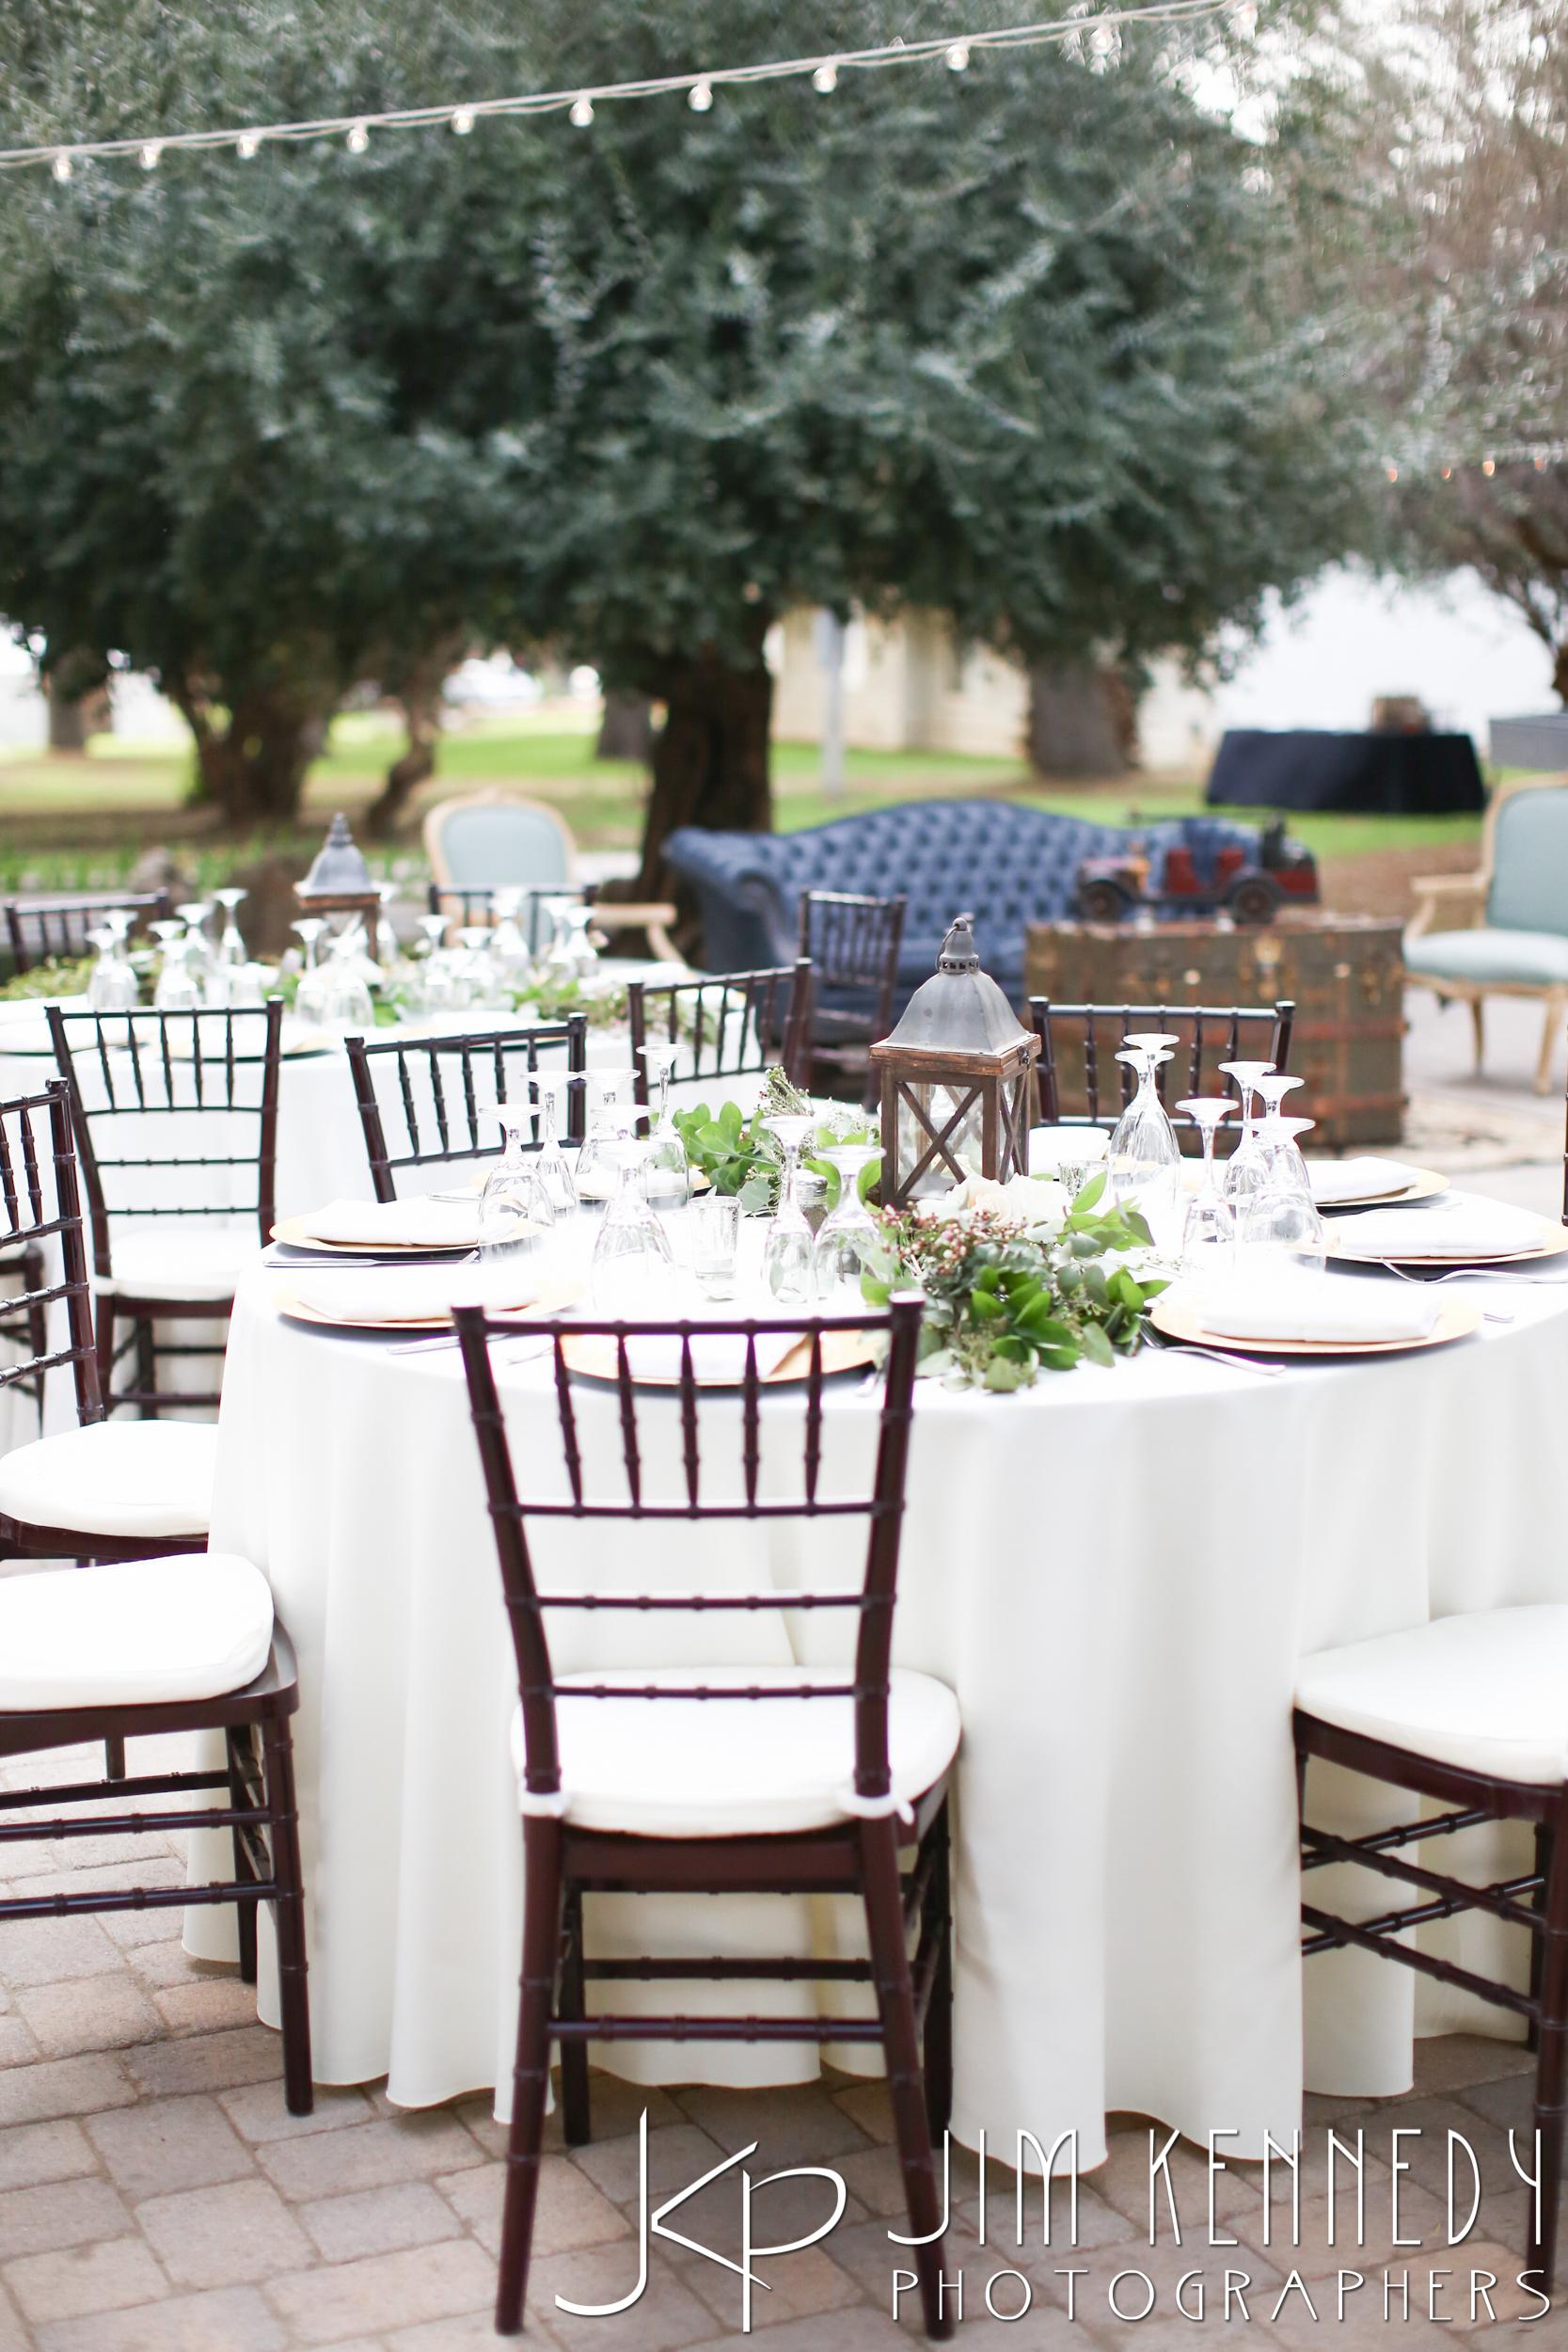 jim_kennedy_photographers_highland_springs_wedding_caitlyn_0170.jpg